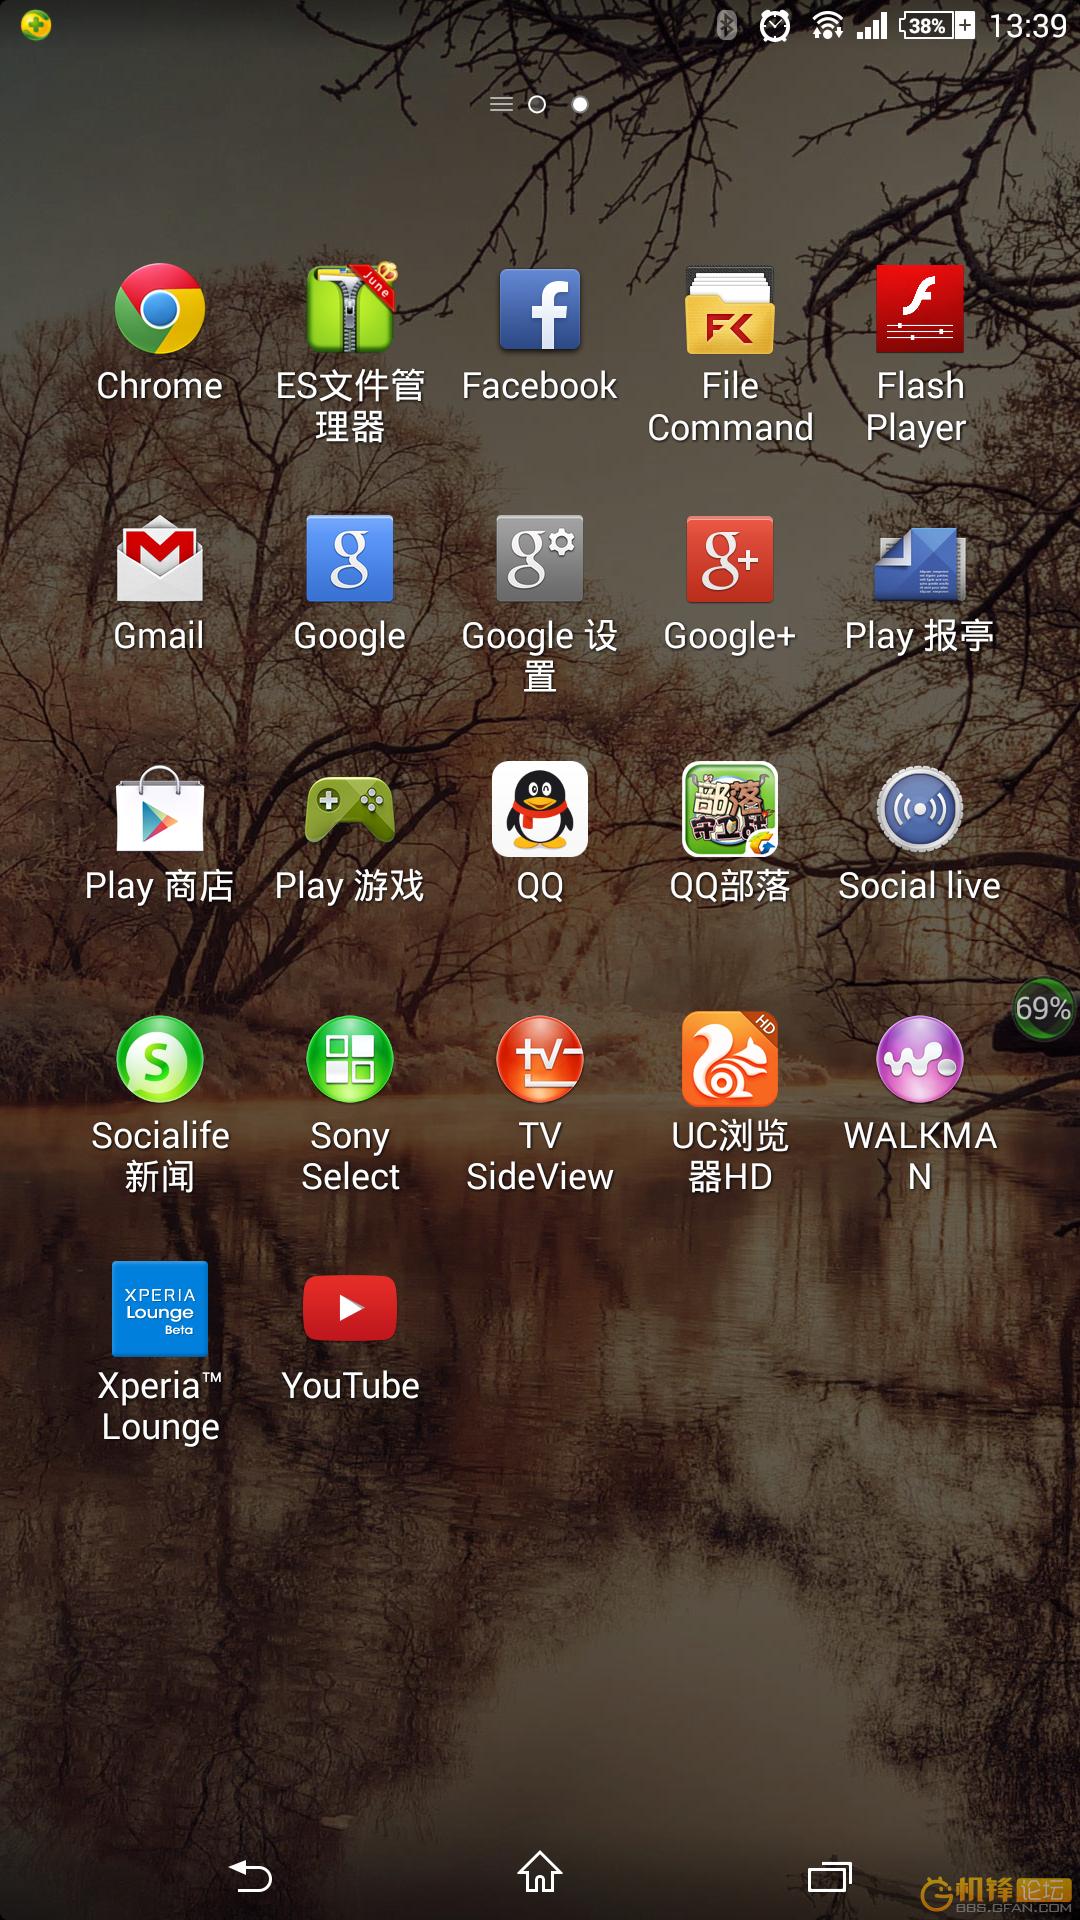 Xperia Z Ultra 14.3.A.0.681 Home App KitKat